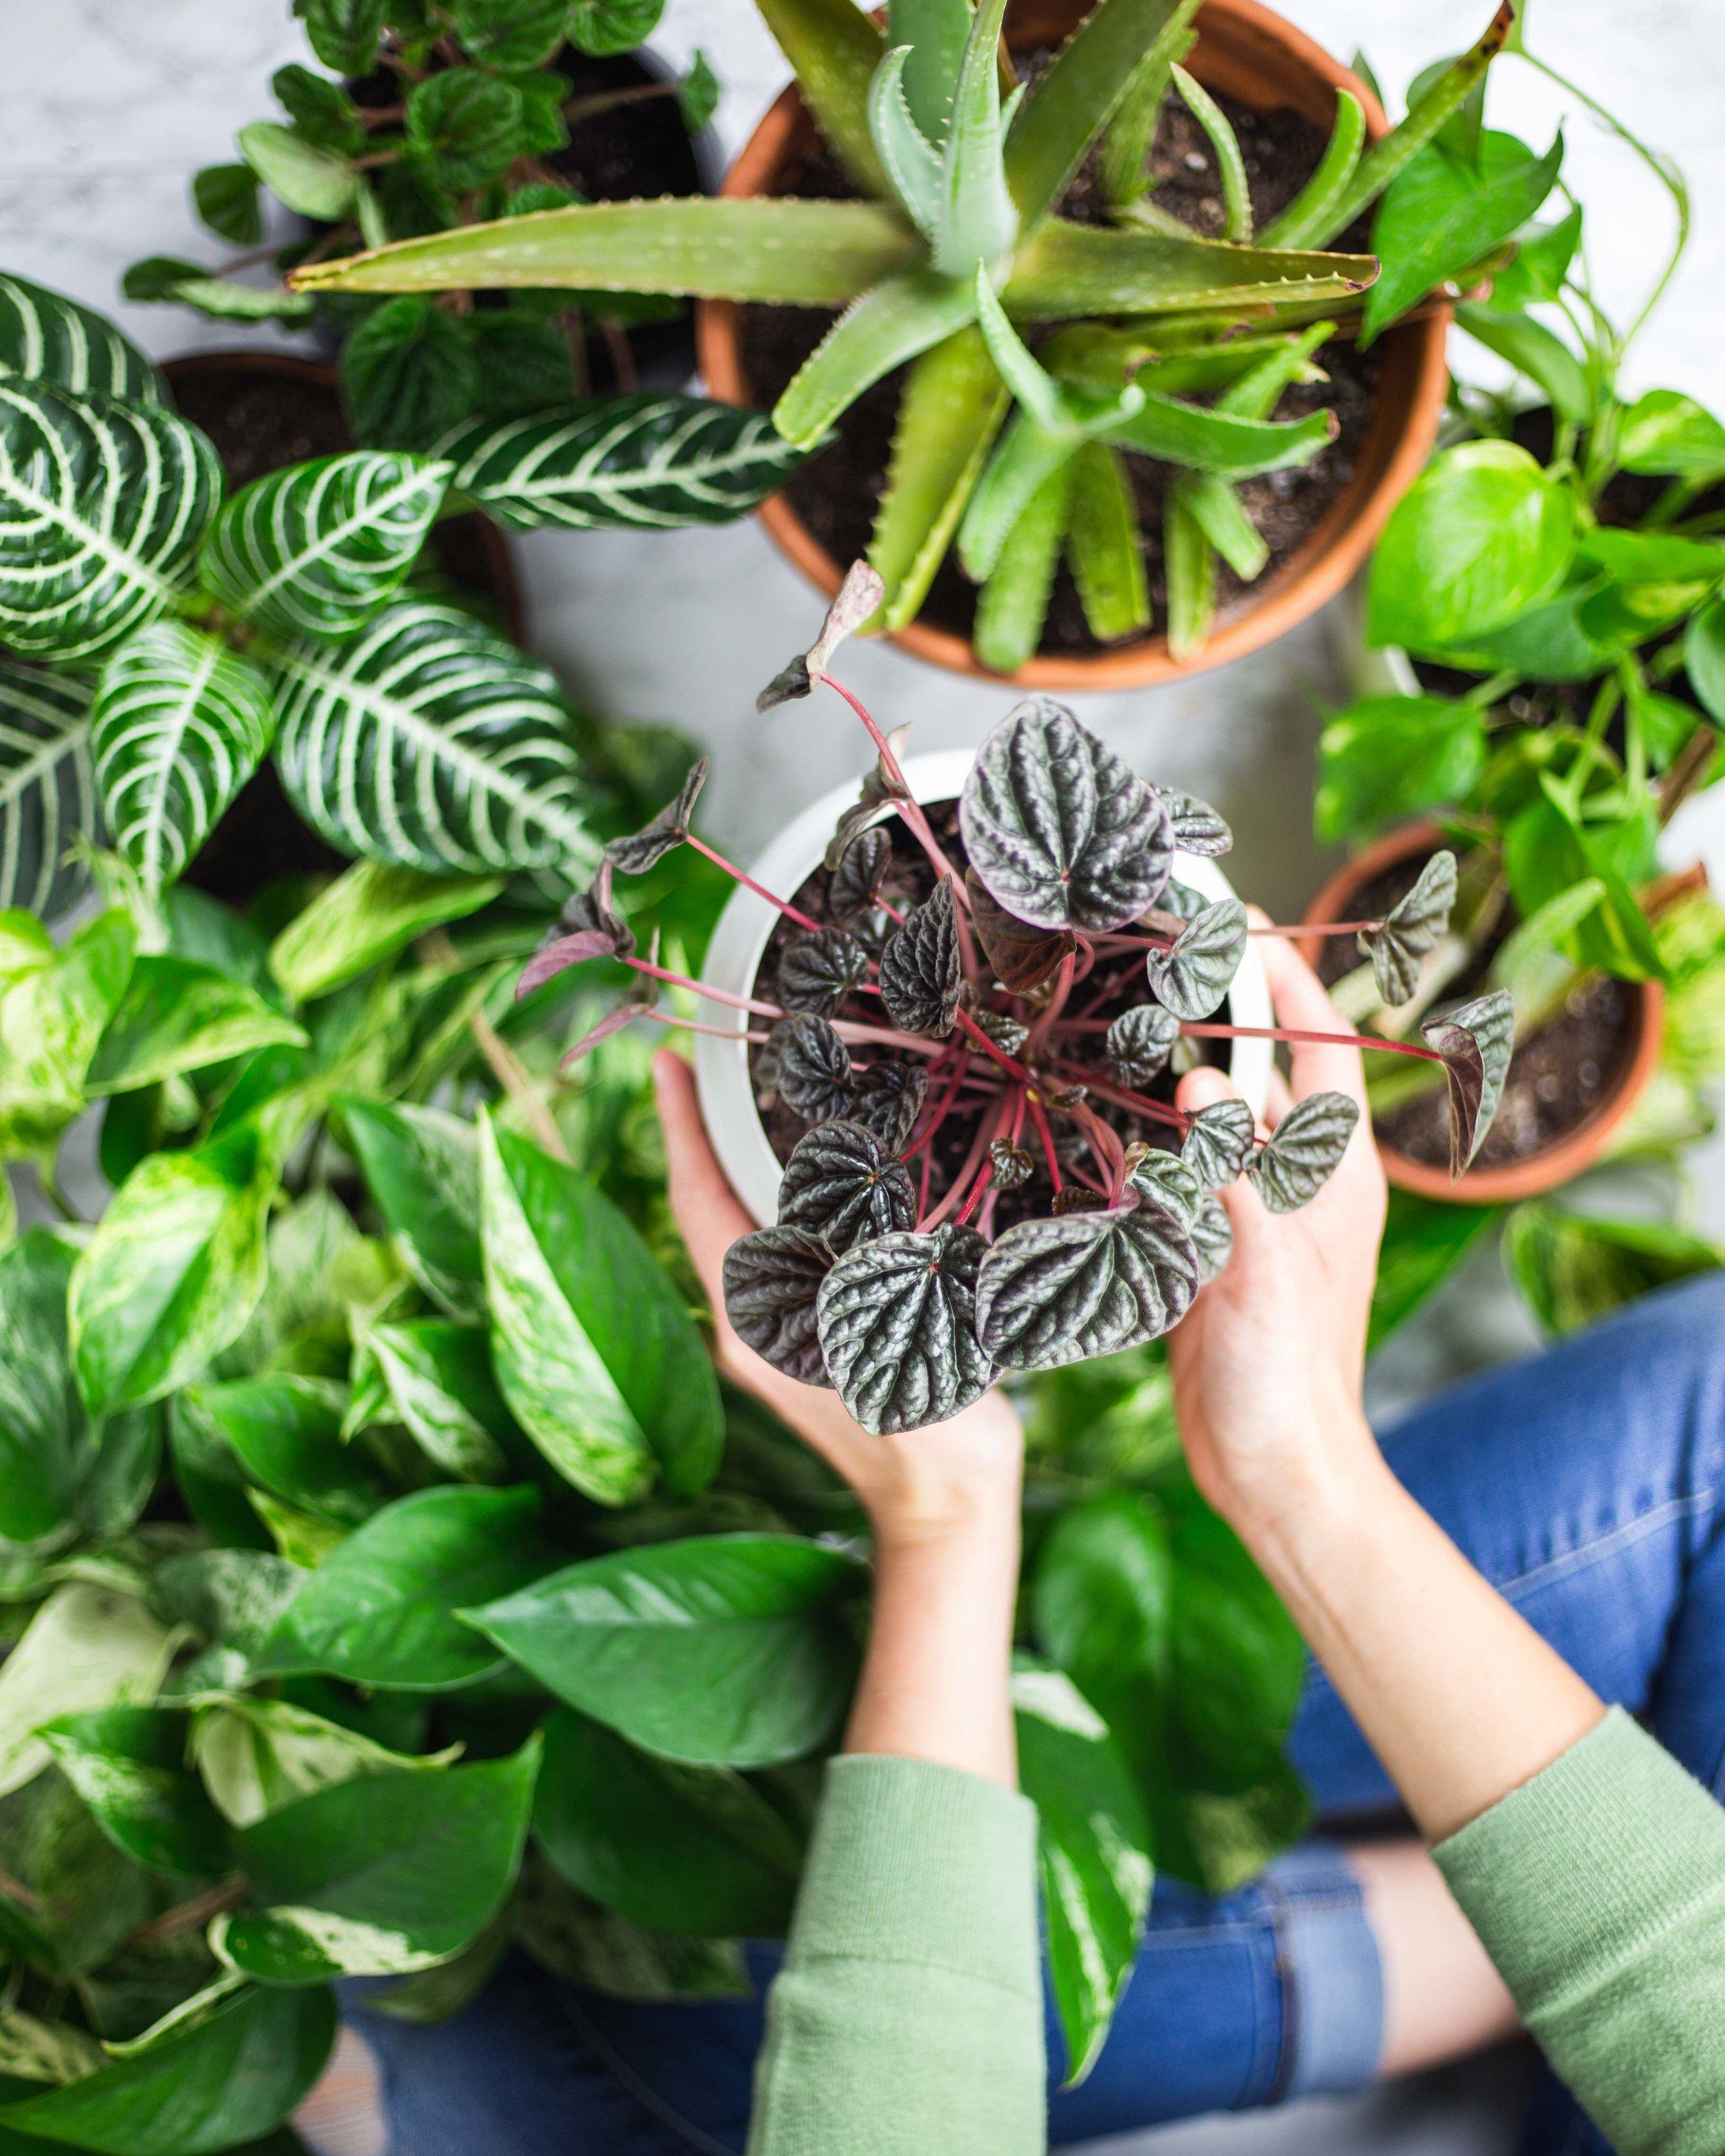 Houseplants for Better Health | Health Benefits of Houseplants + 5 Houseplants to Purify Air